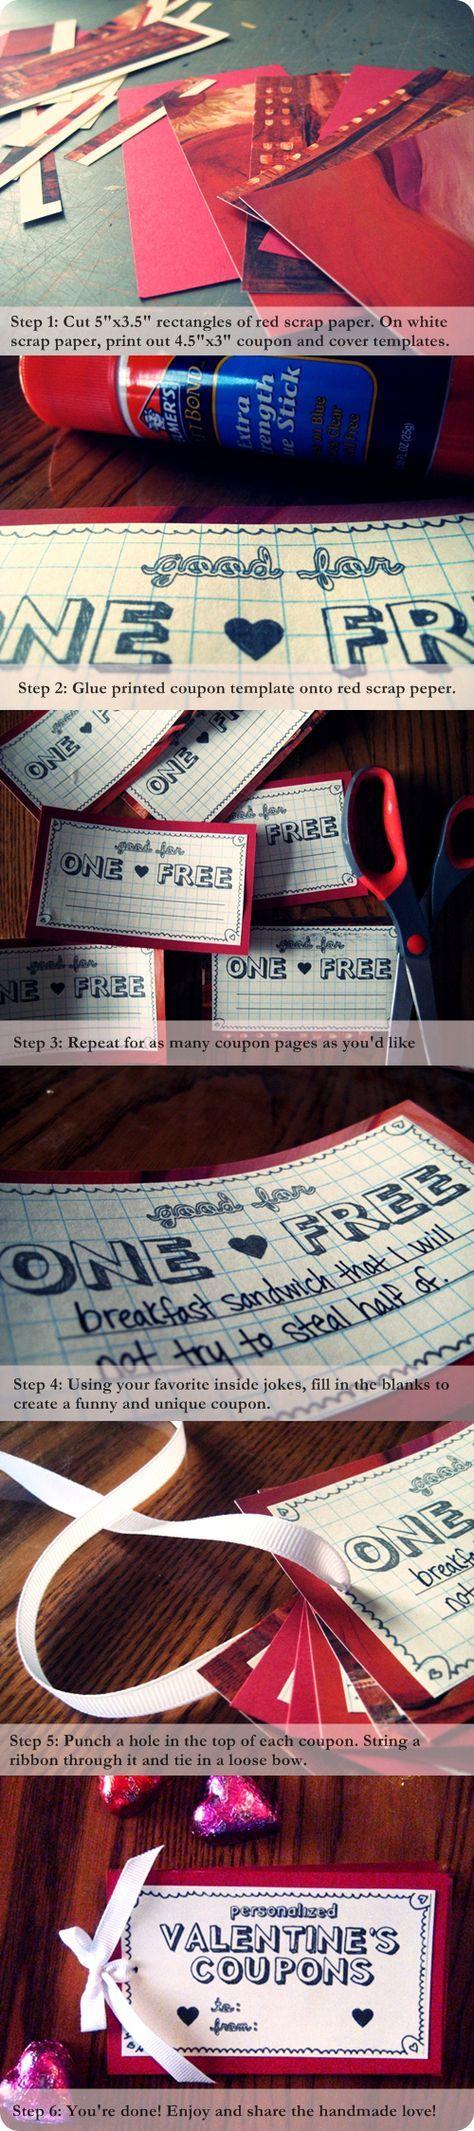 best 25  coupon books ideas on pinterest